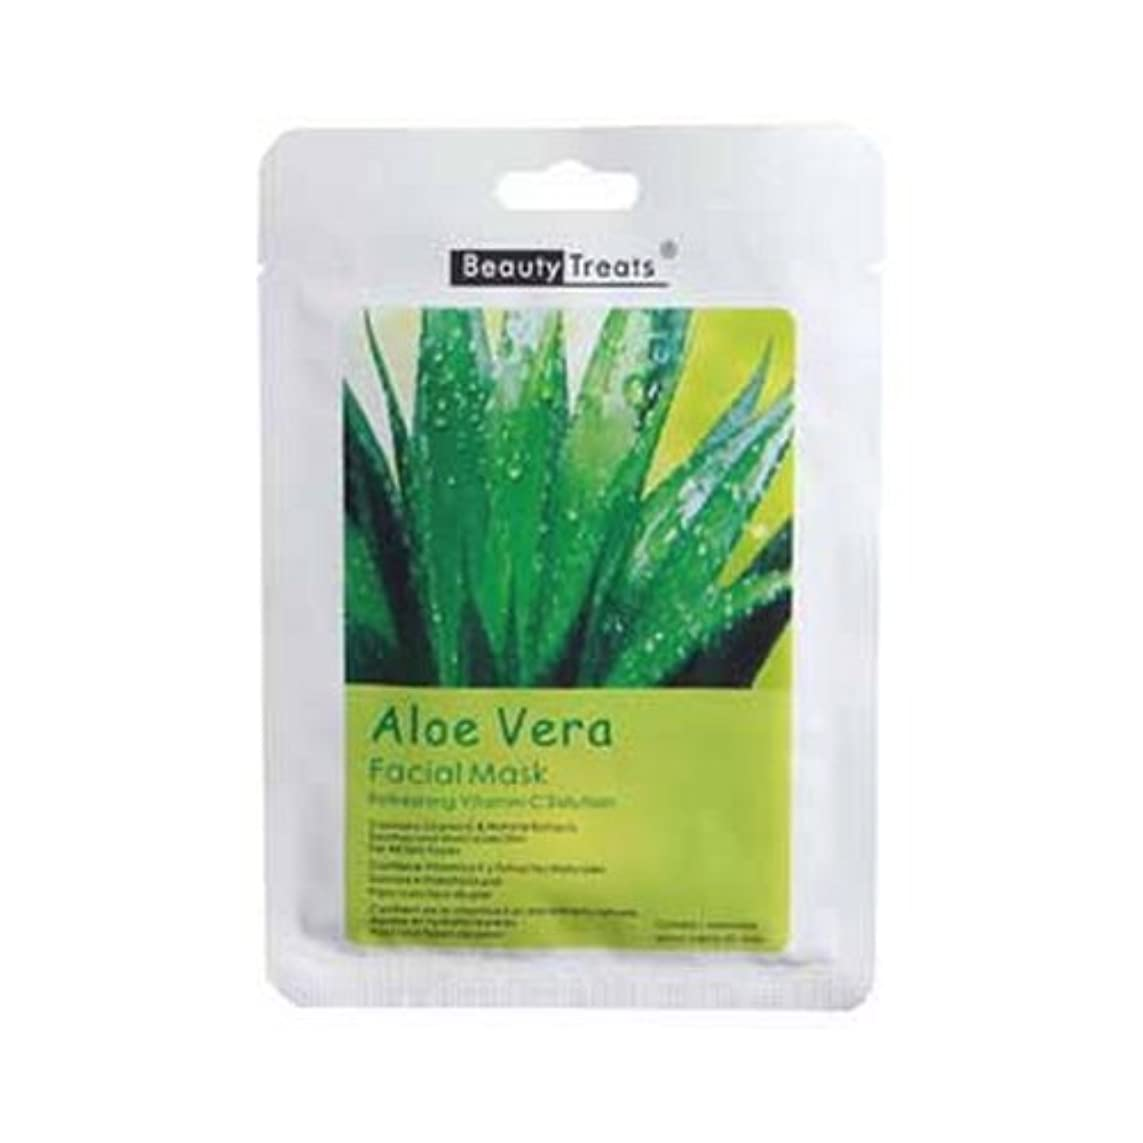 (3 Pack) BEAUTY TREATS Facial Mask Refreshing Vitamin C Solution - Aloe Vera (並行輸入品)